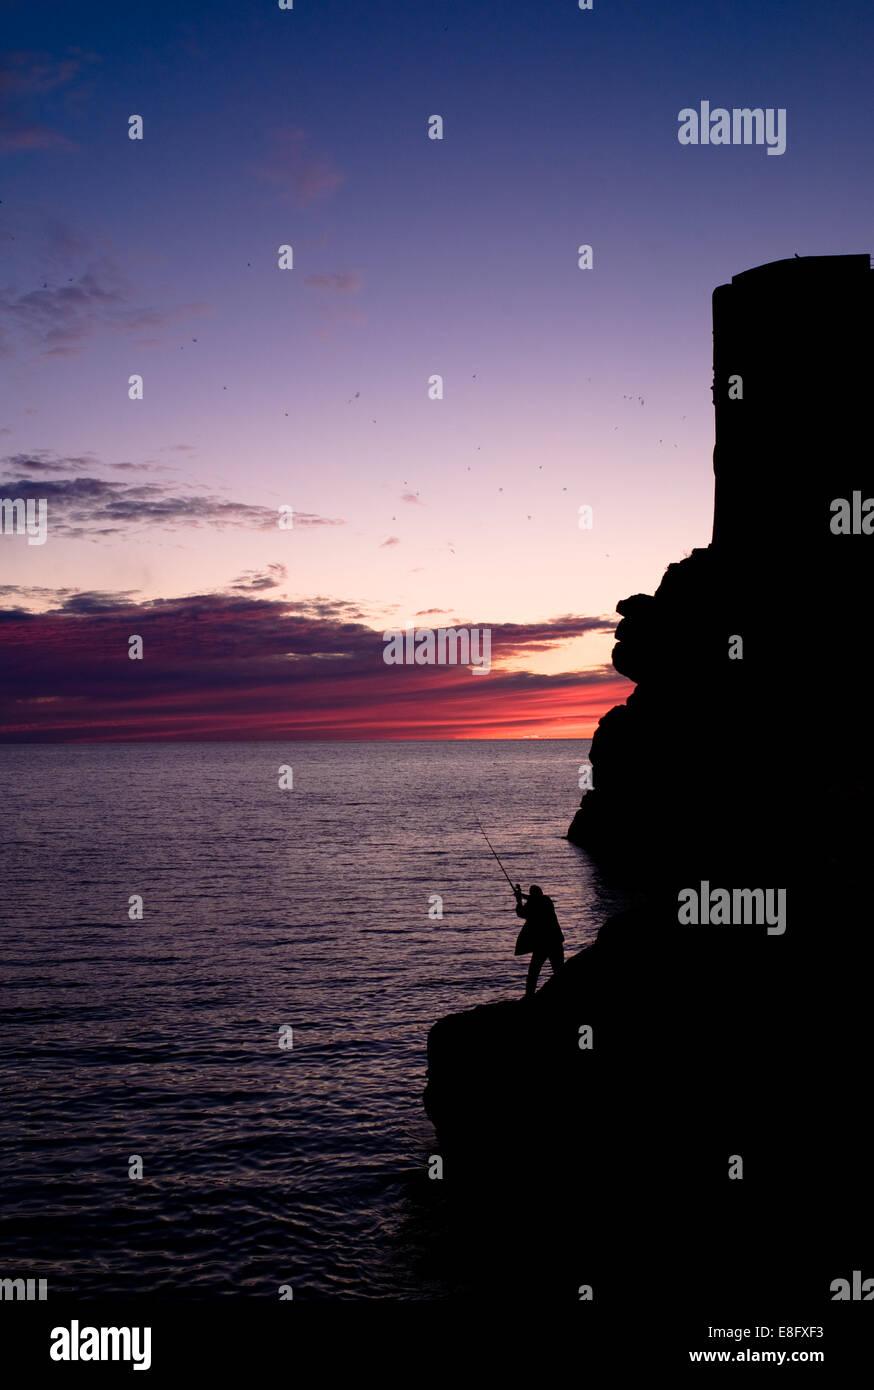 Croatia, Dubrovnik-Neretva, Dubrovnik, Silhouette of man fishing from rock formation - Stock Image